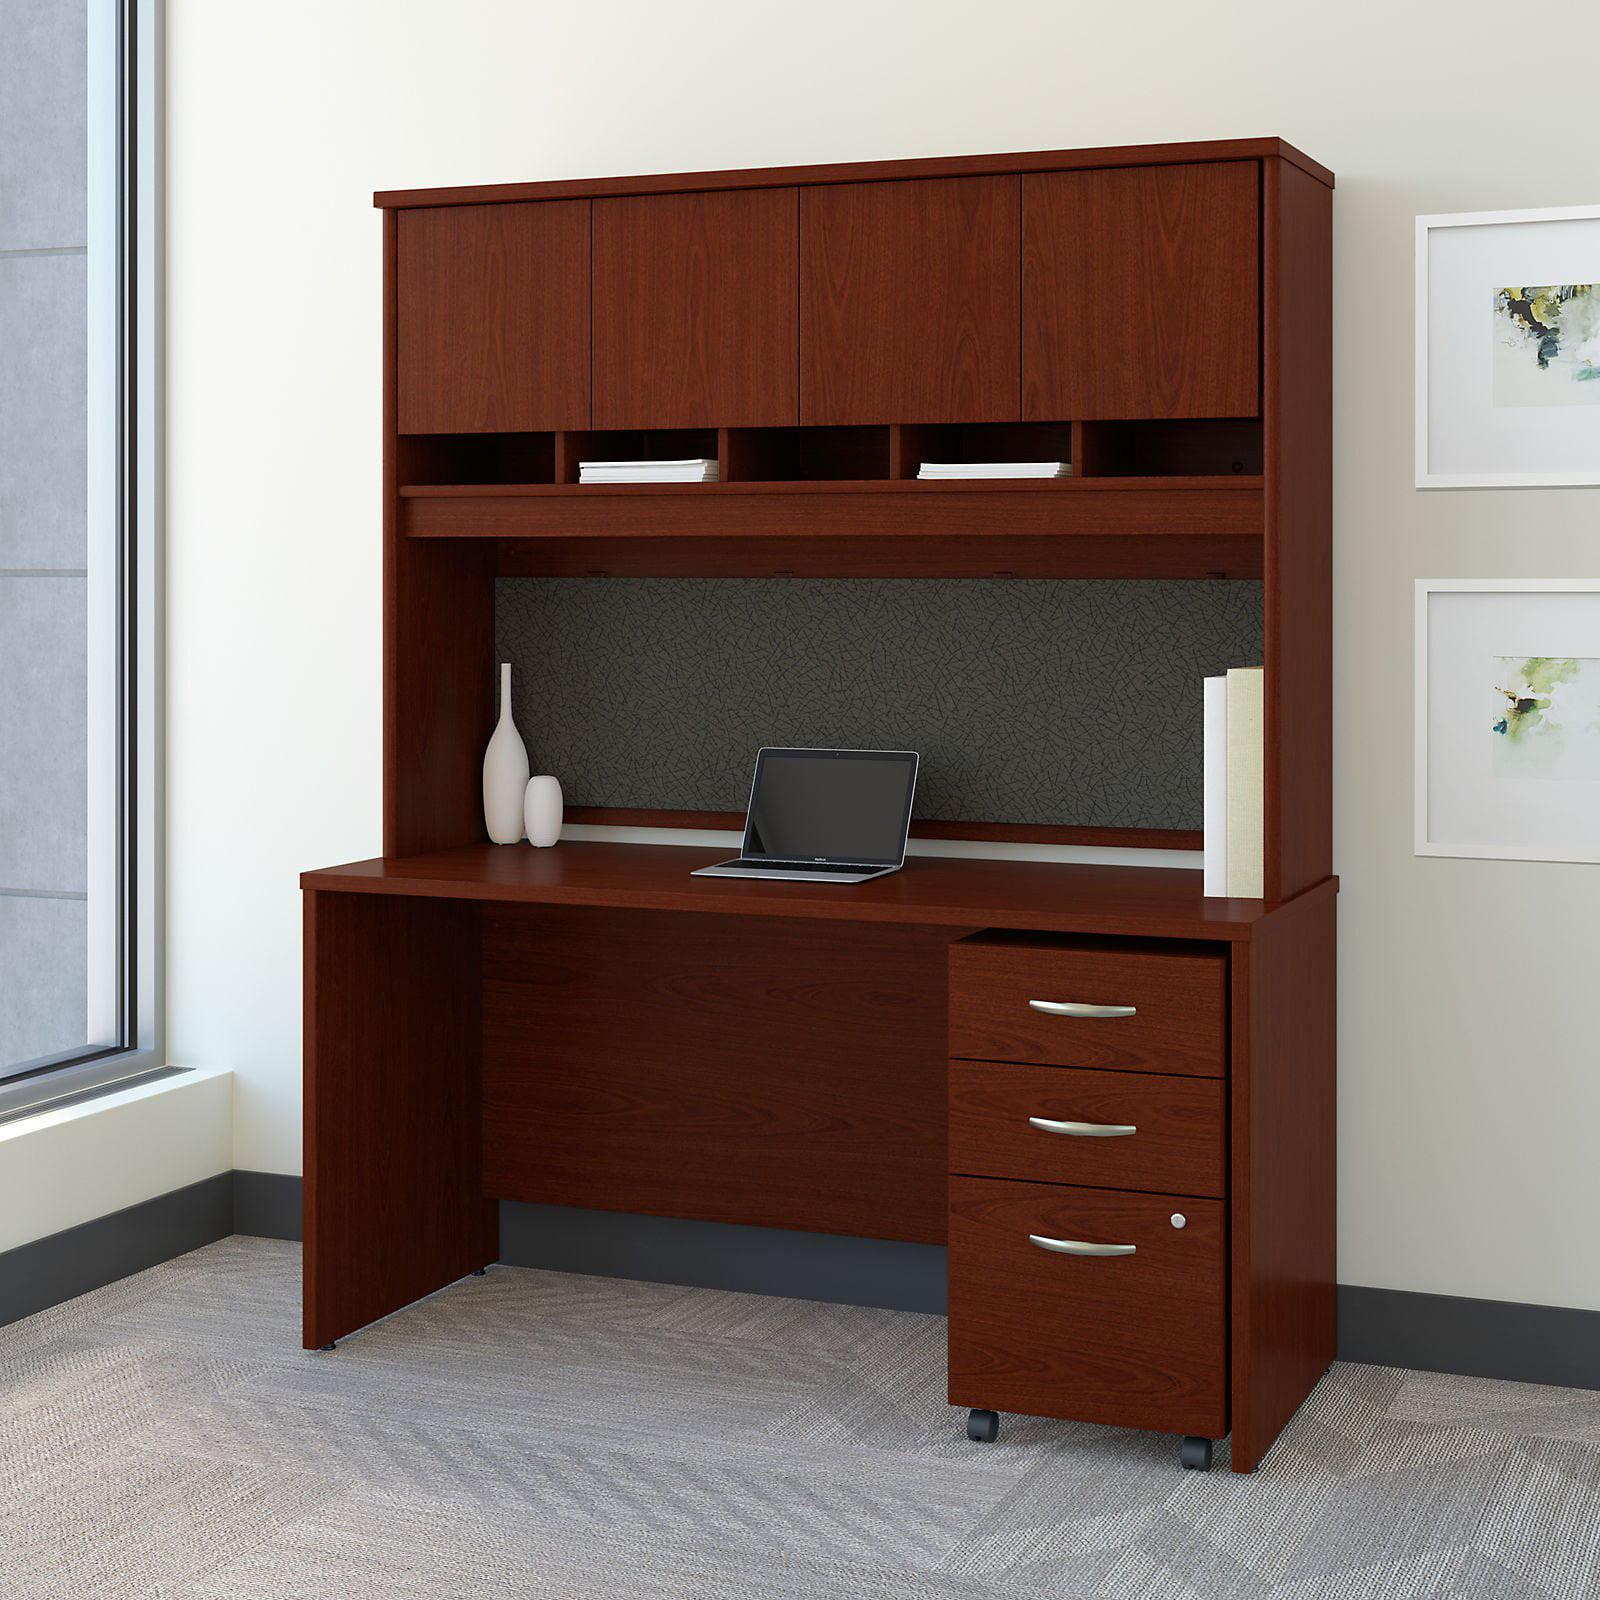 BBF Bush Furniture Series C 60 in. Office Desk with Hutch...